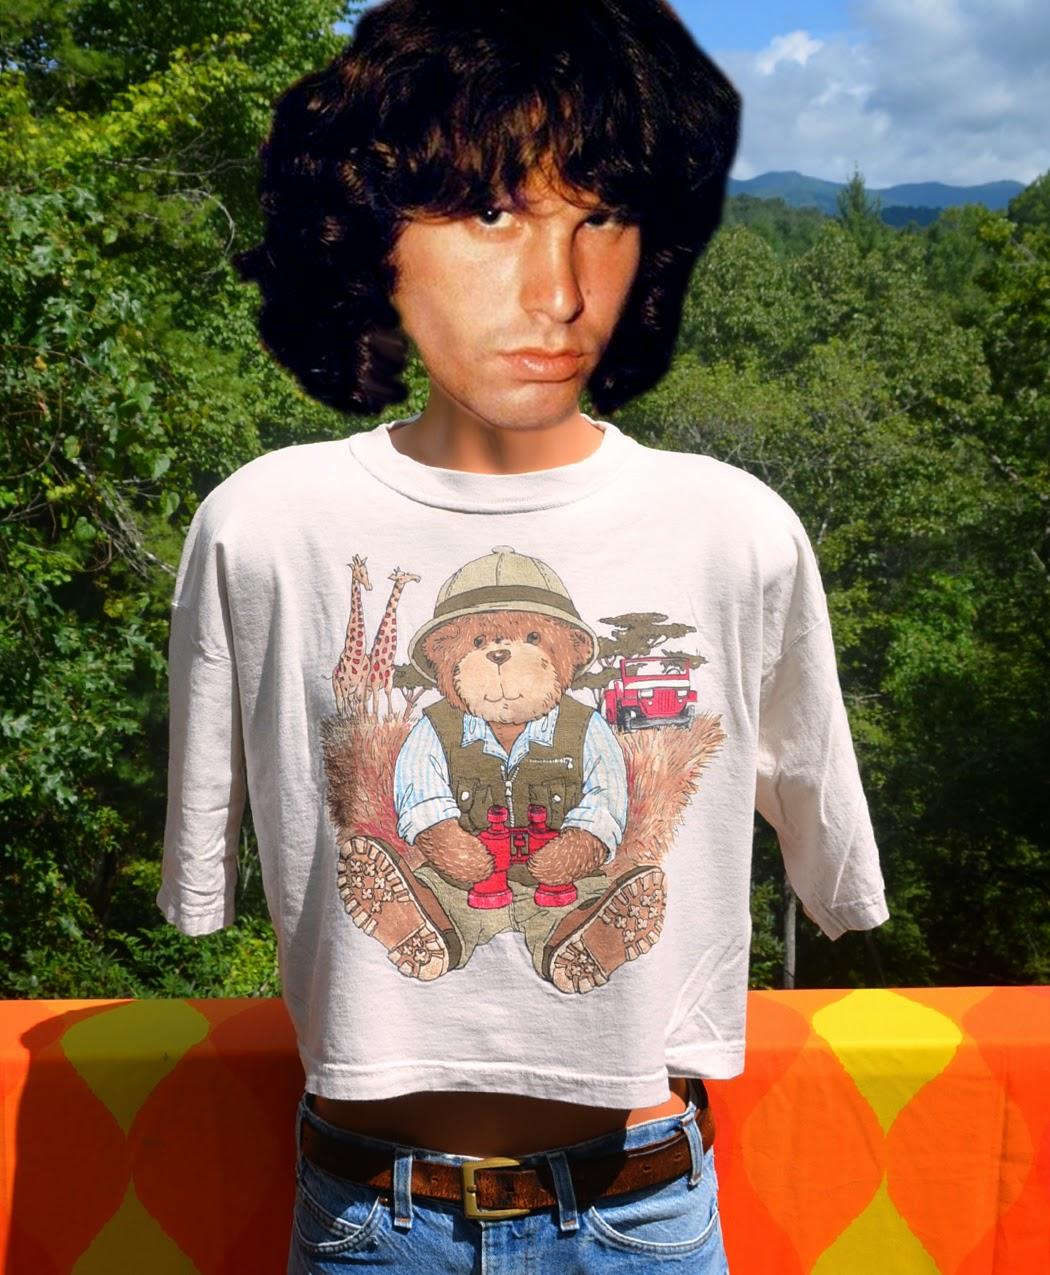 https://www.etsy.com/listing/203745873/80s-vintage-half-t-shirt-safari-teddy